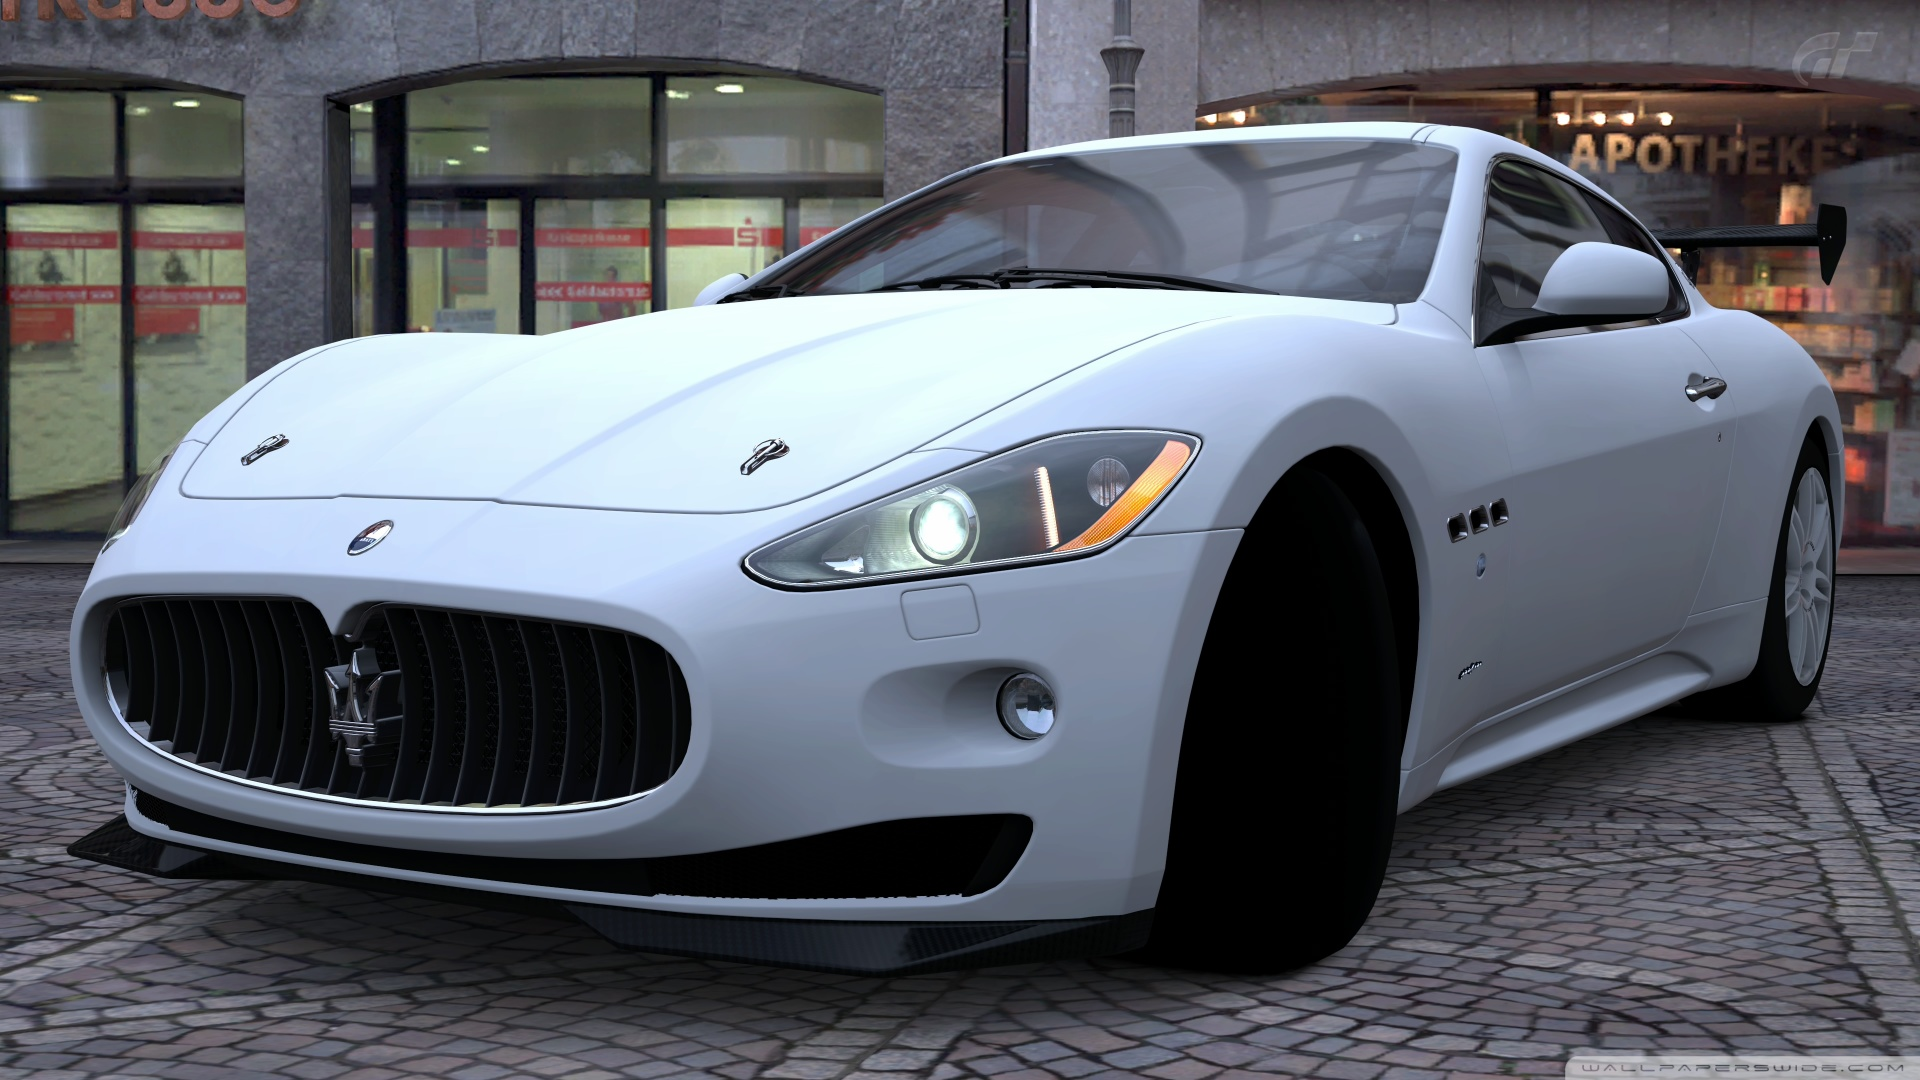 Maserati GranTurismo 4K HD Desktop Wallpaper For 4K Ultra